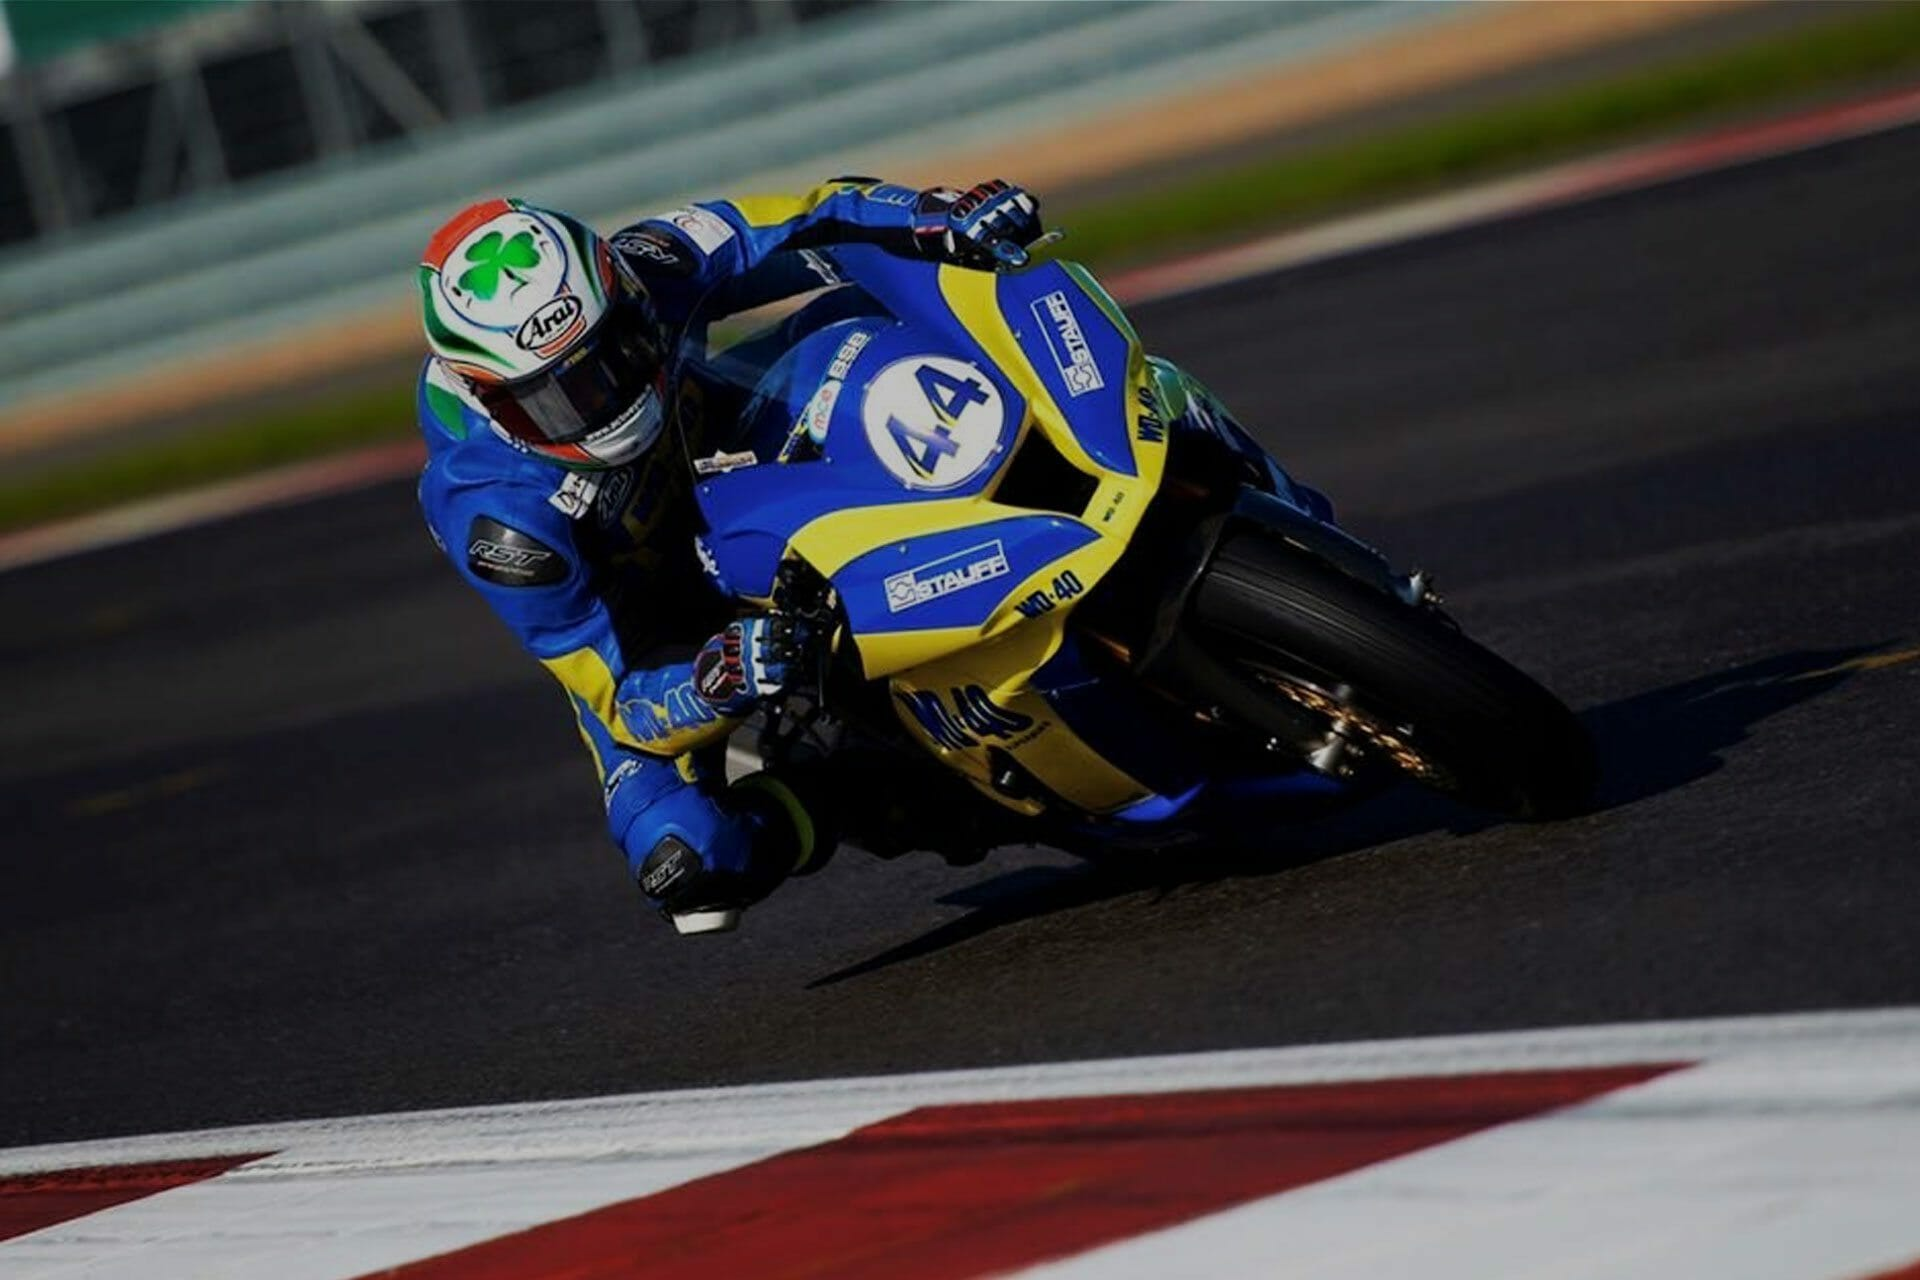 WD-40 Superbike Motorbike team